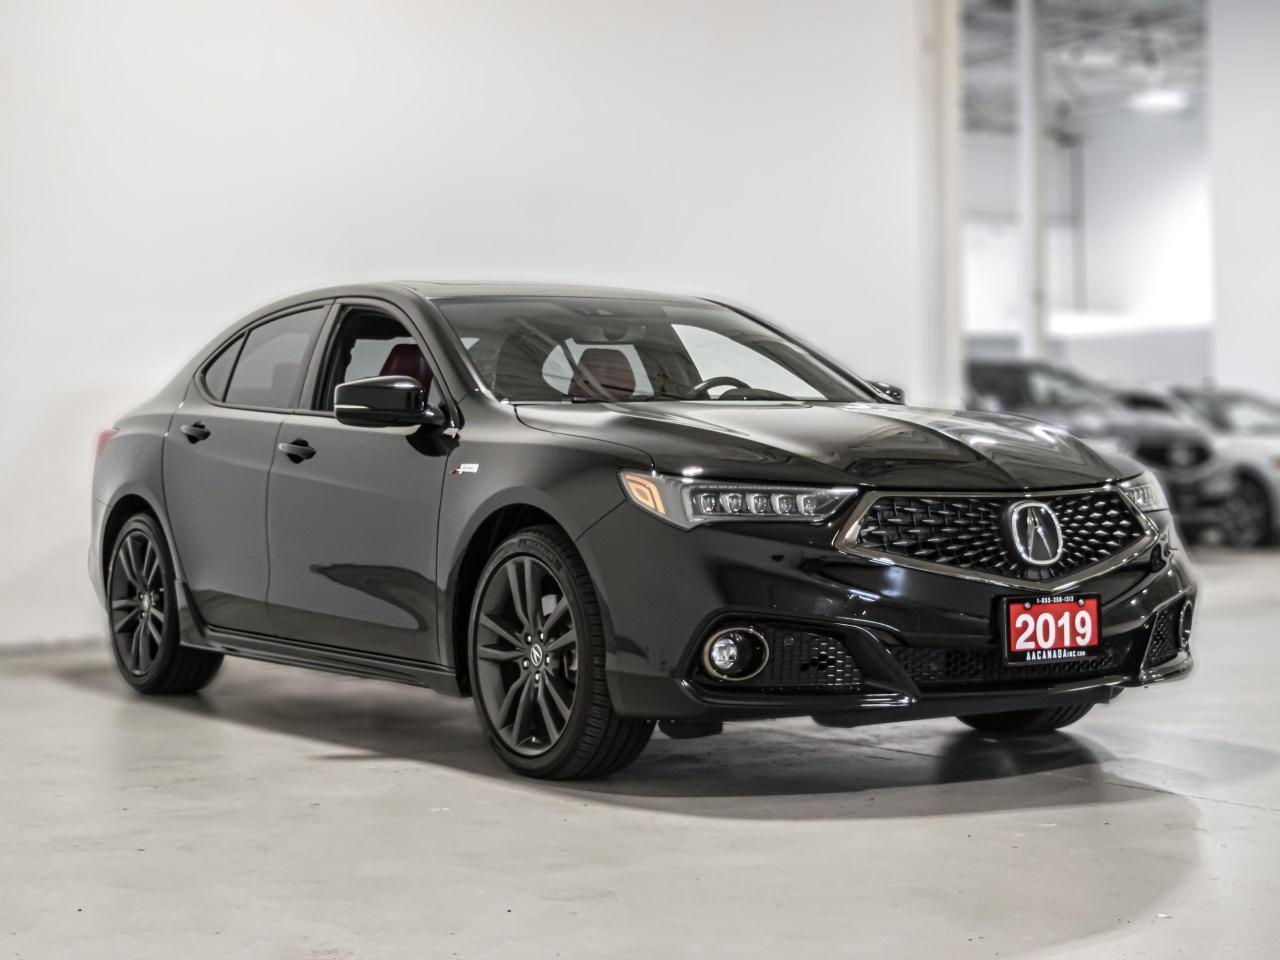 2019 Acura TLX